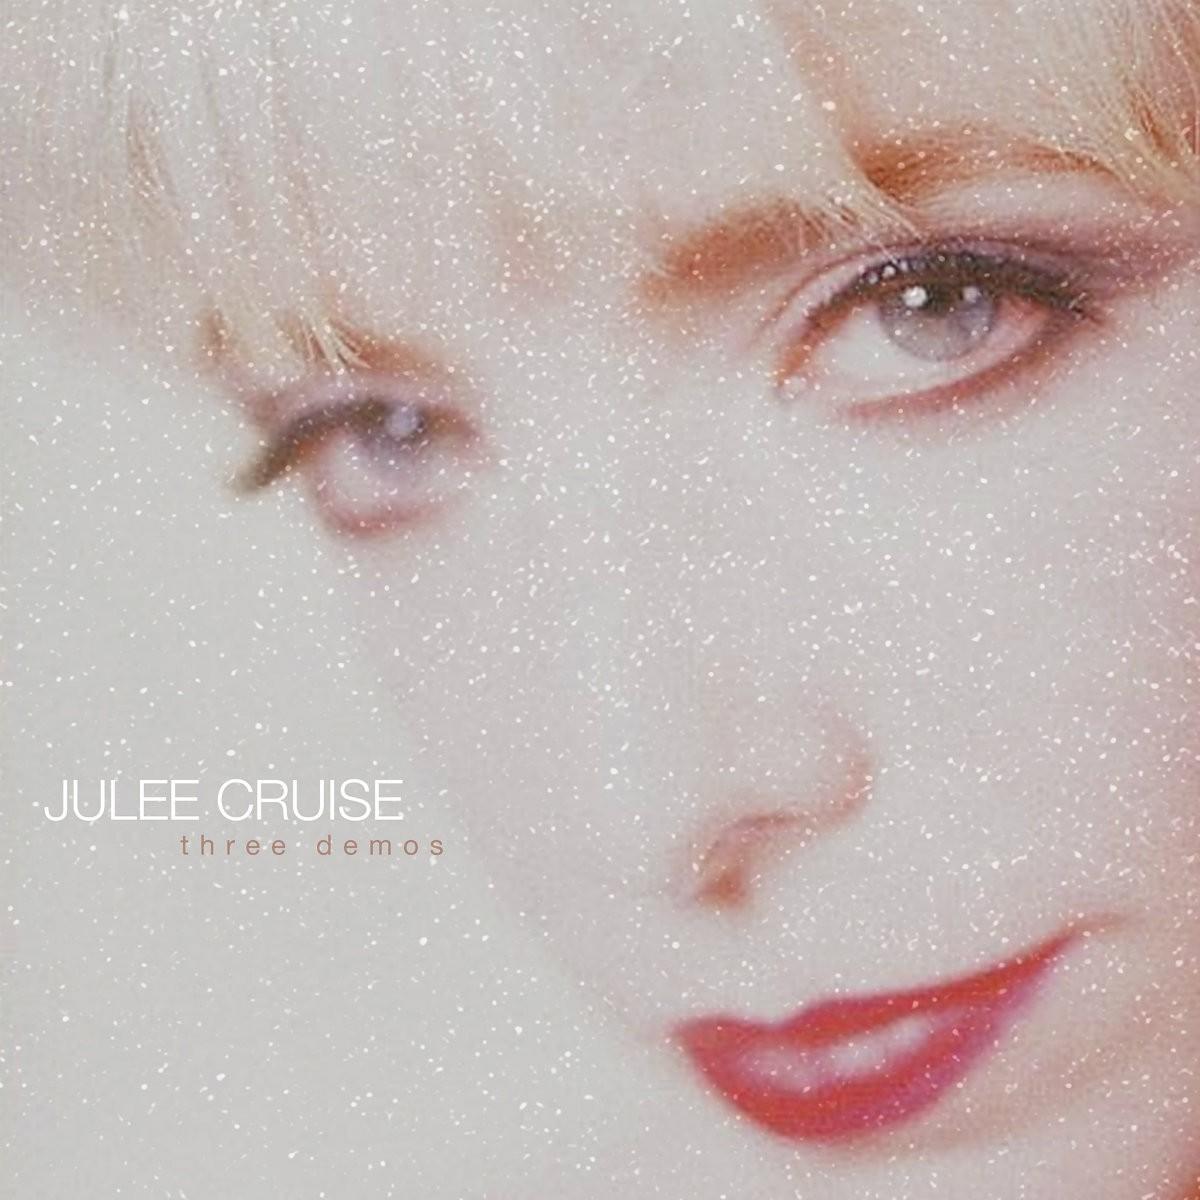 Sacred Bones to Reissue Julee Cruise Demos